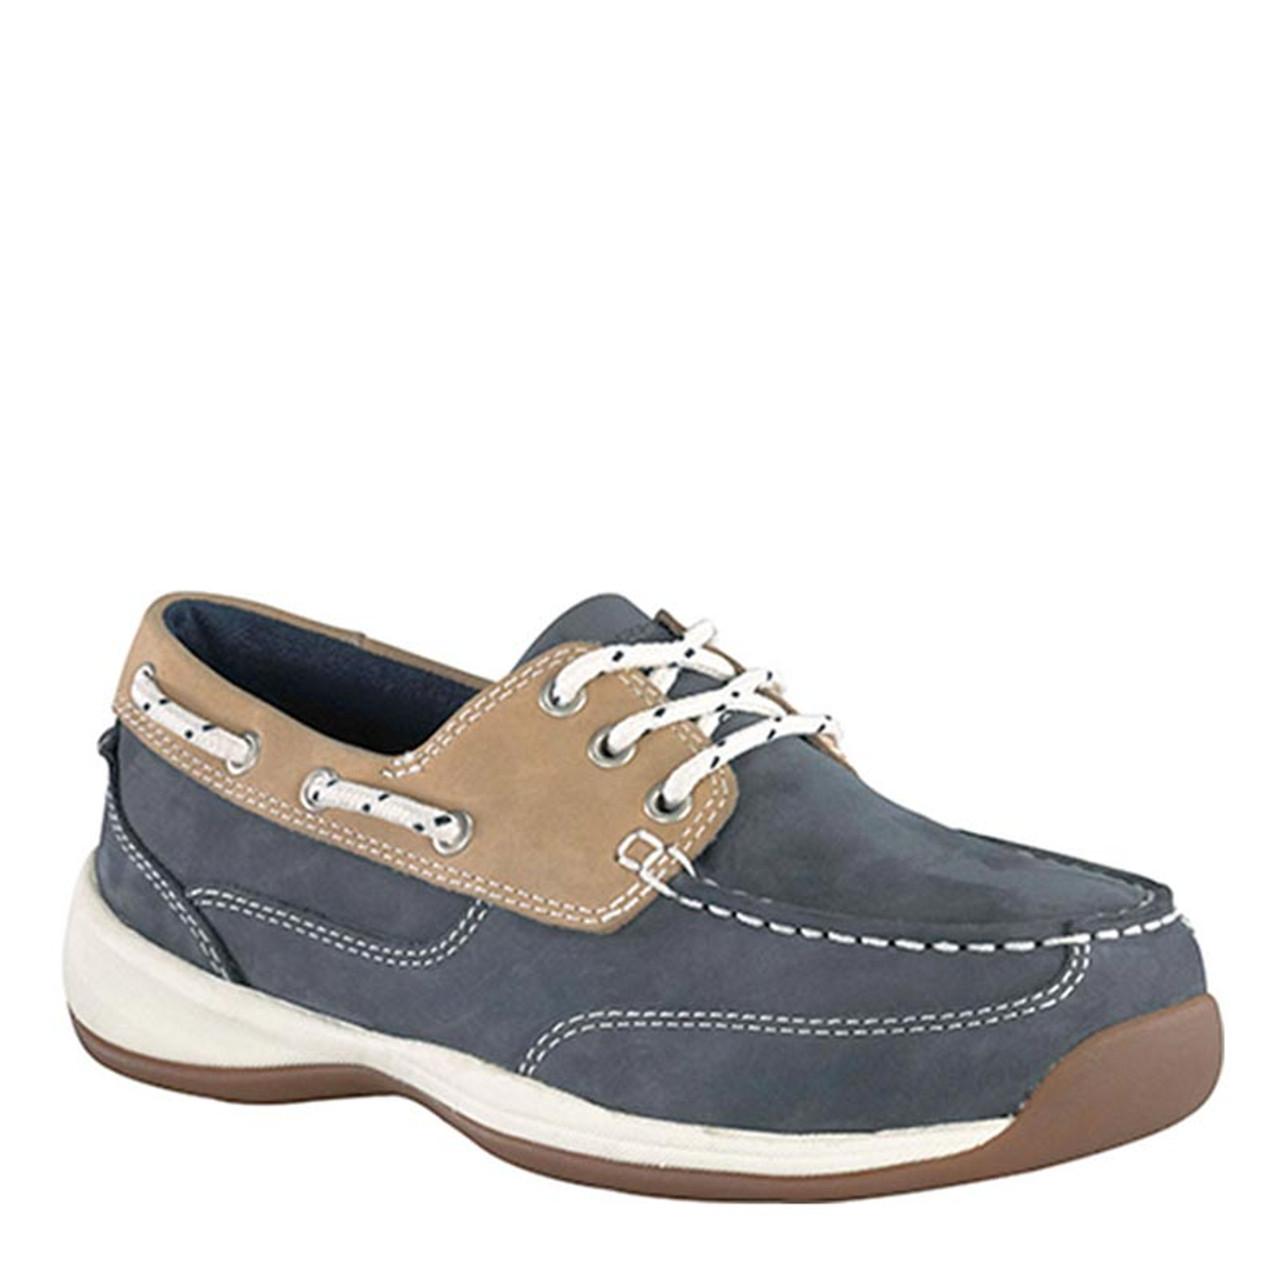 f40ad766fff Rockport Works RK670 Women's Steel Toe Sailing Club Work Shoes